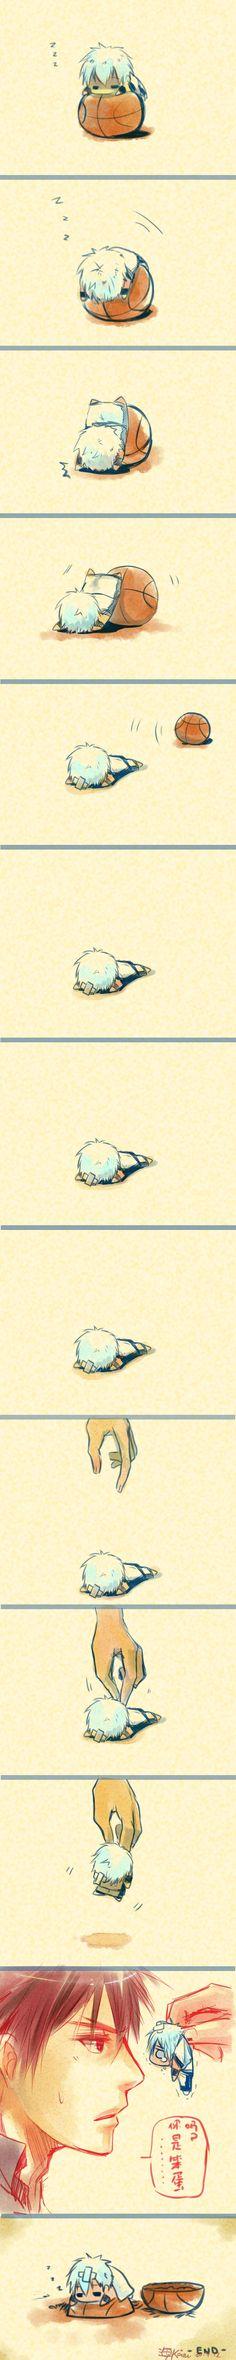 Tags: Anime, Aww kuroko